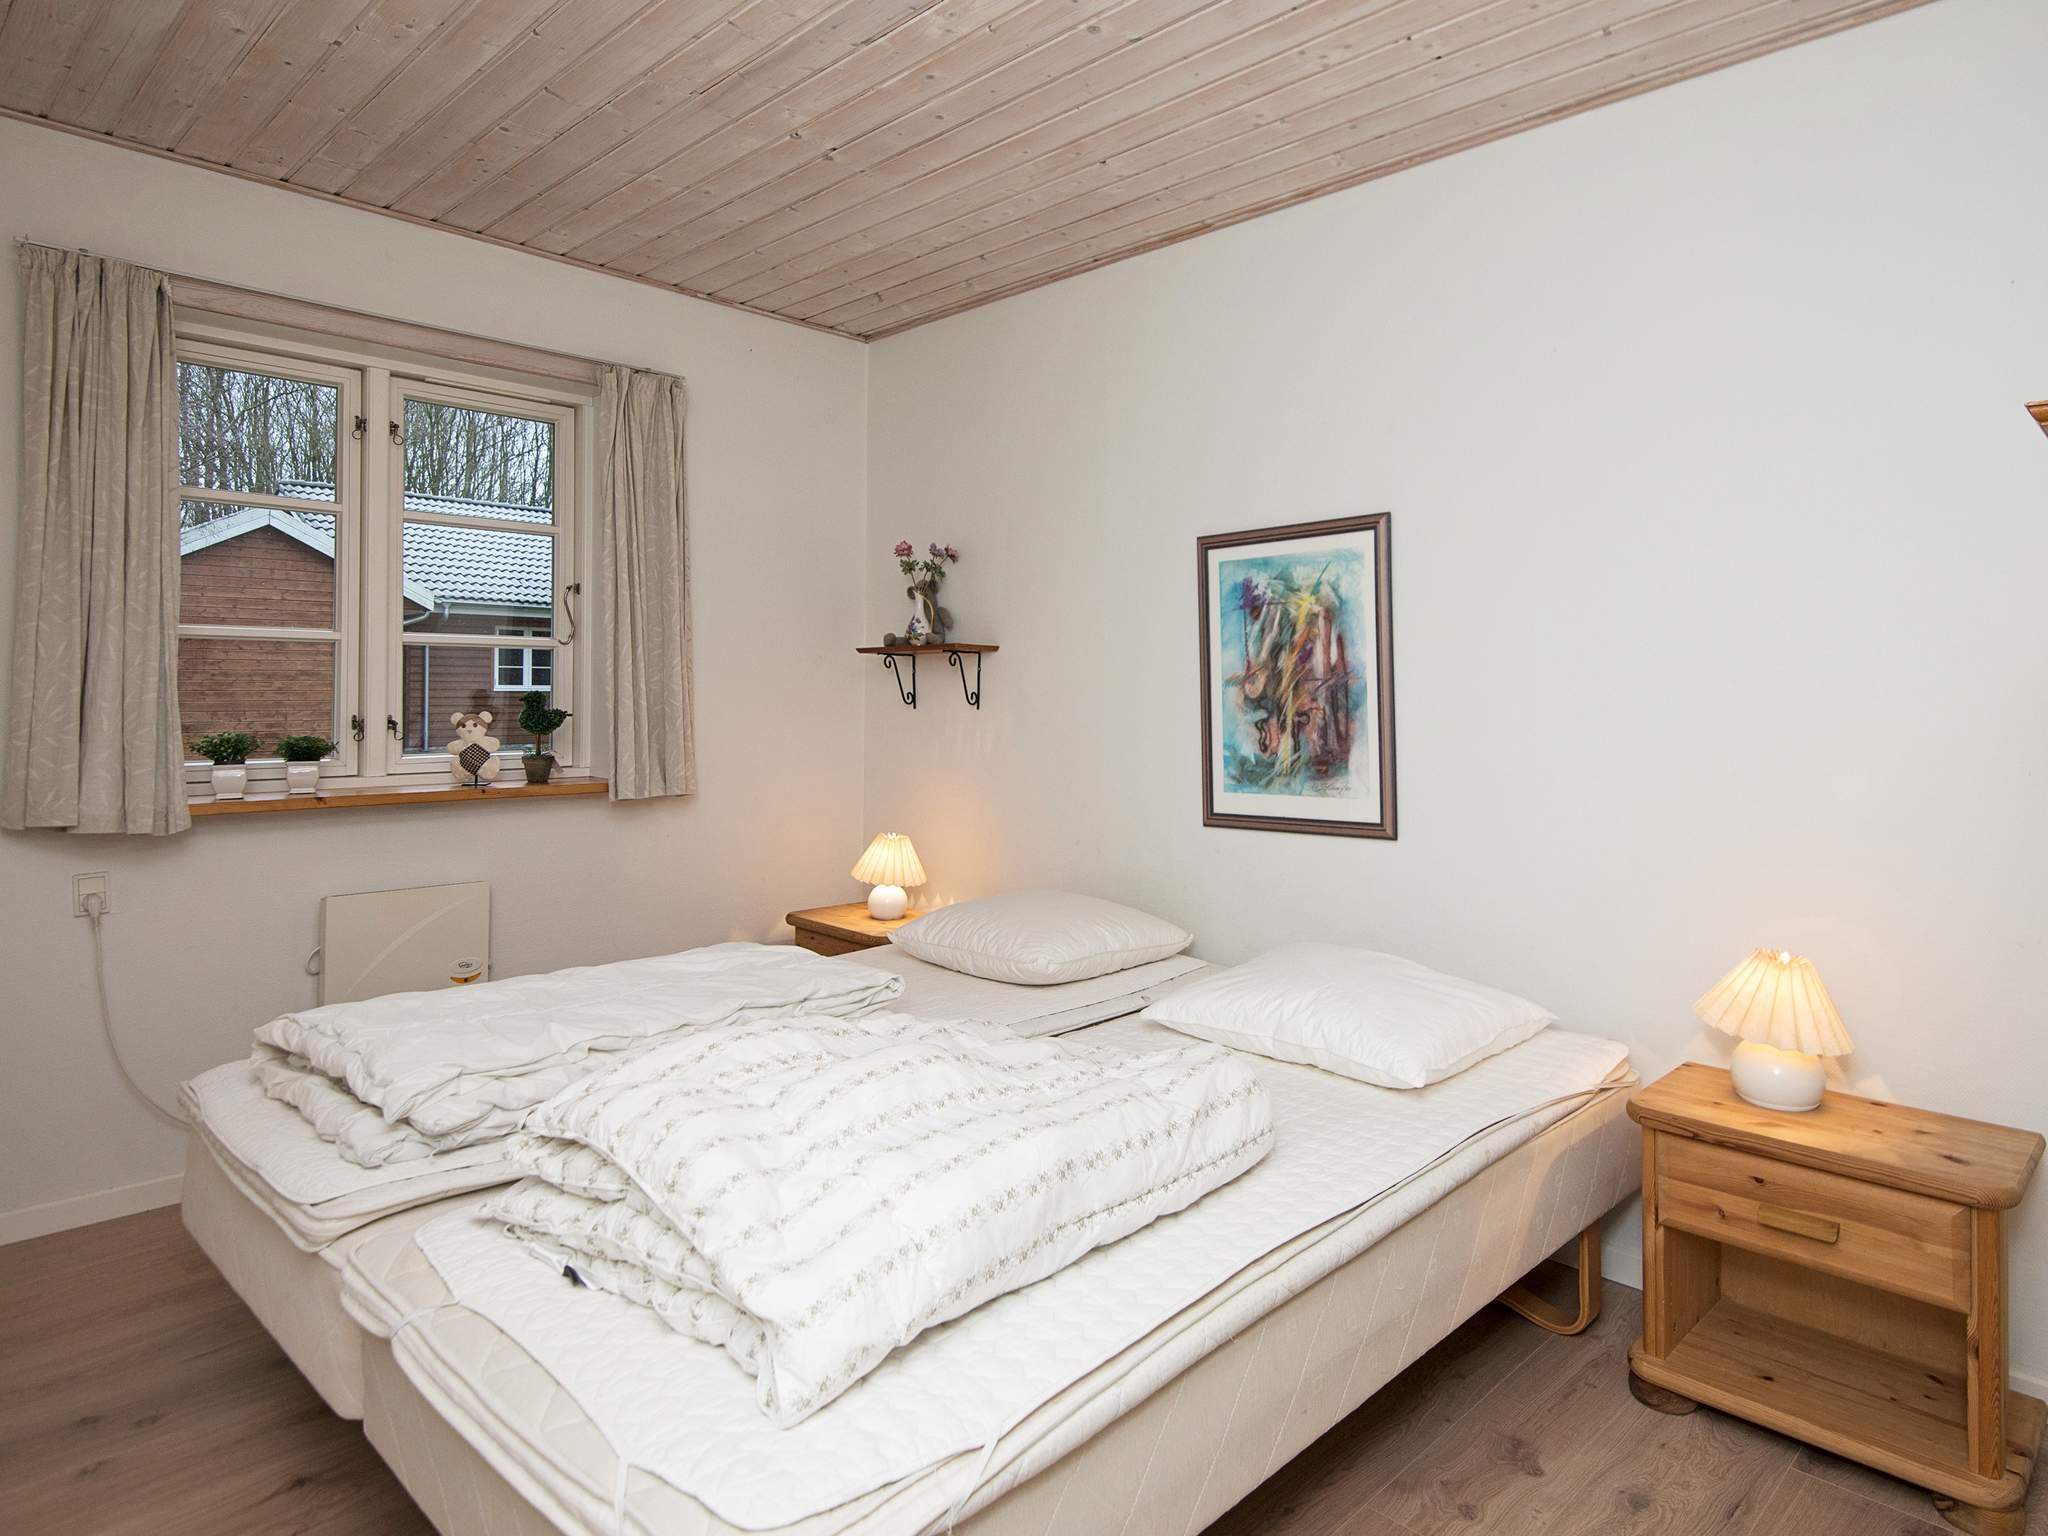 Ferienhaus Arrild (730074), Arrild, , Südwestjütland, Dänemark, Bild 11